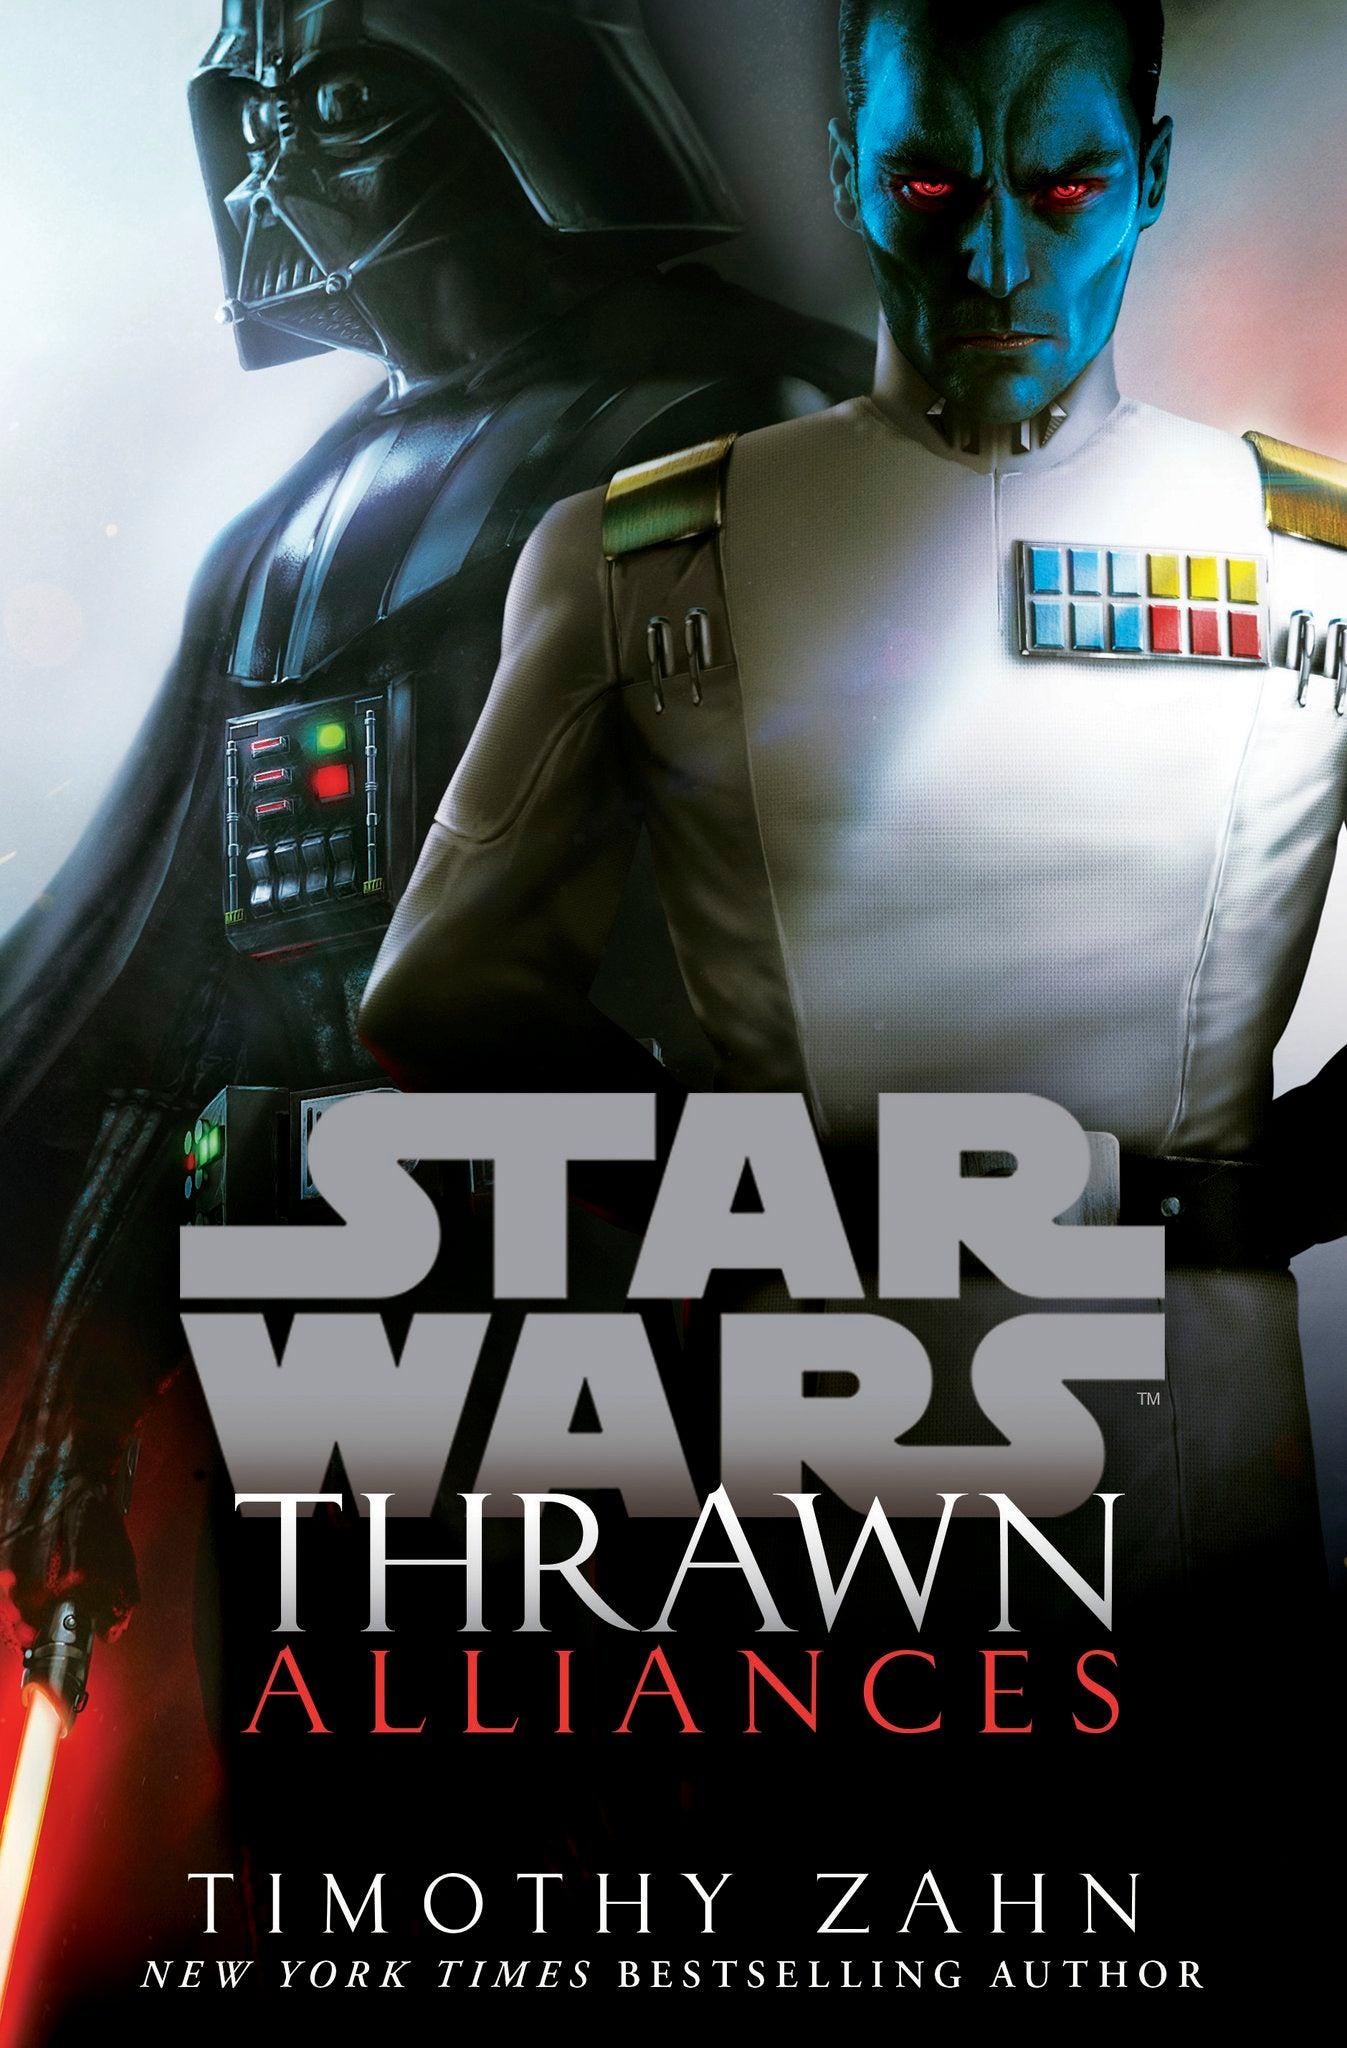 star wars thrawn alliances darth vader cover